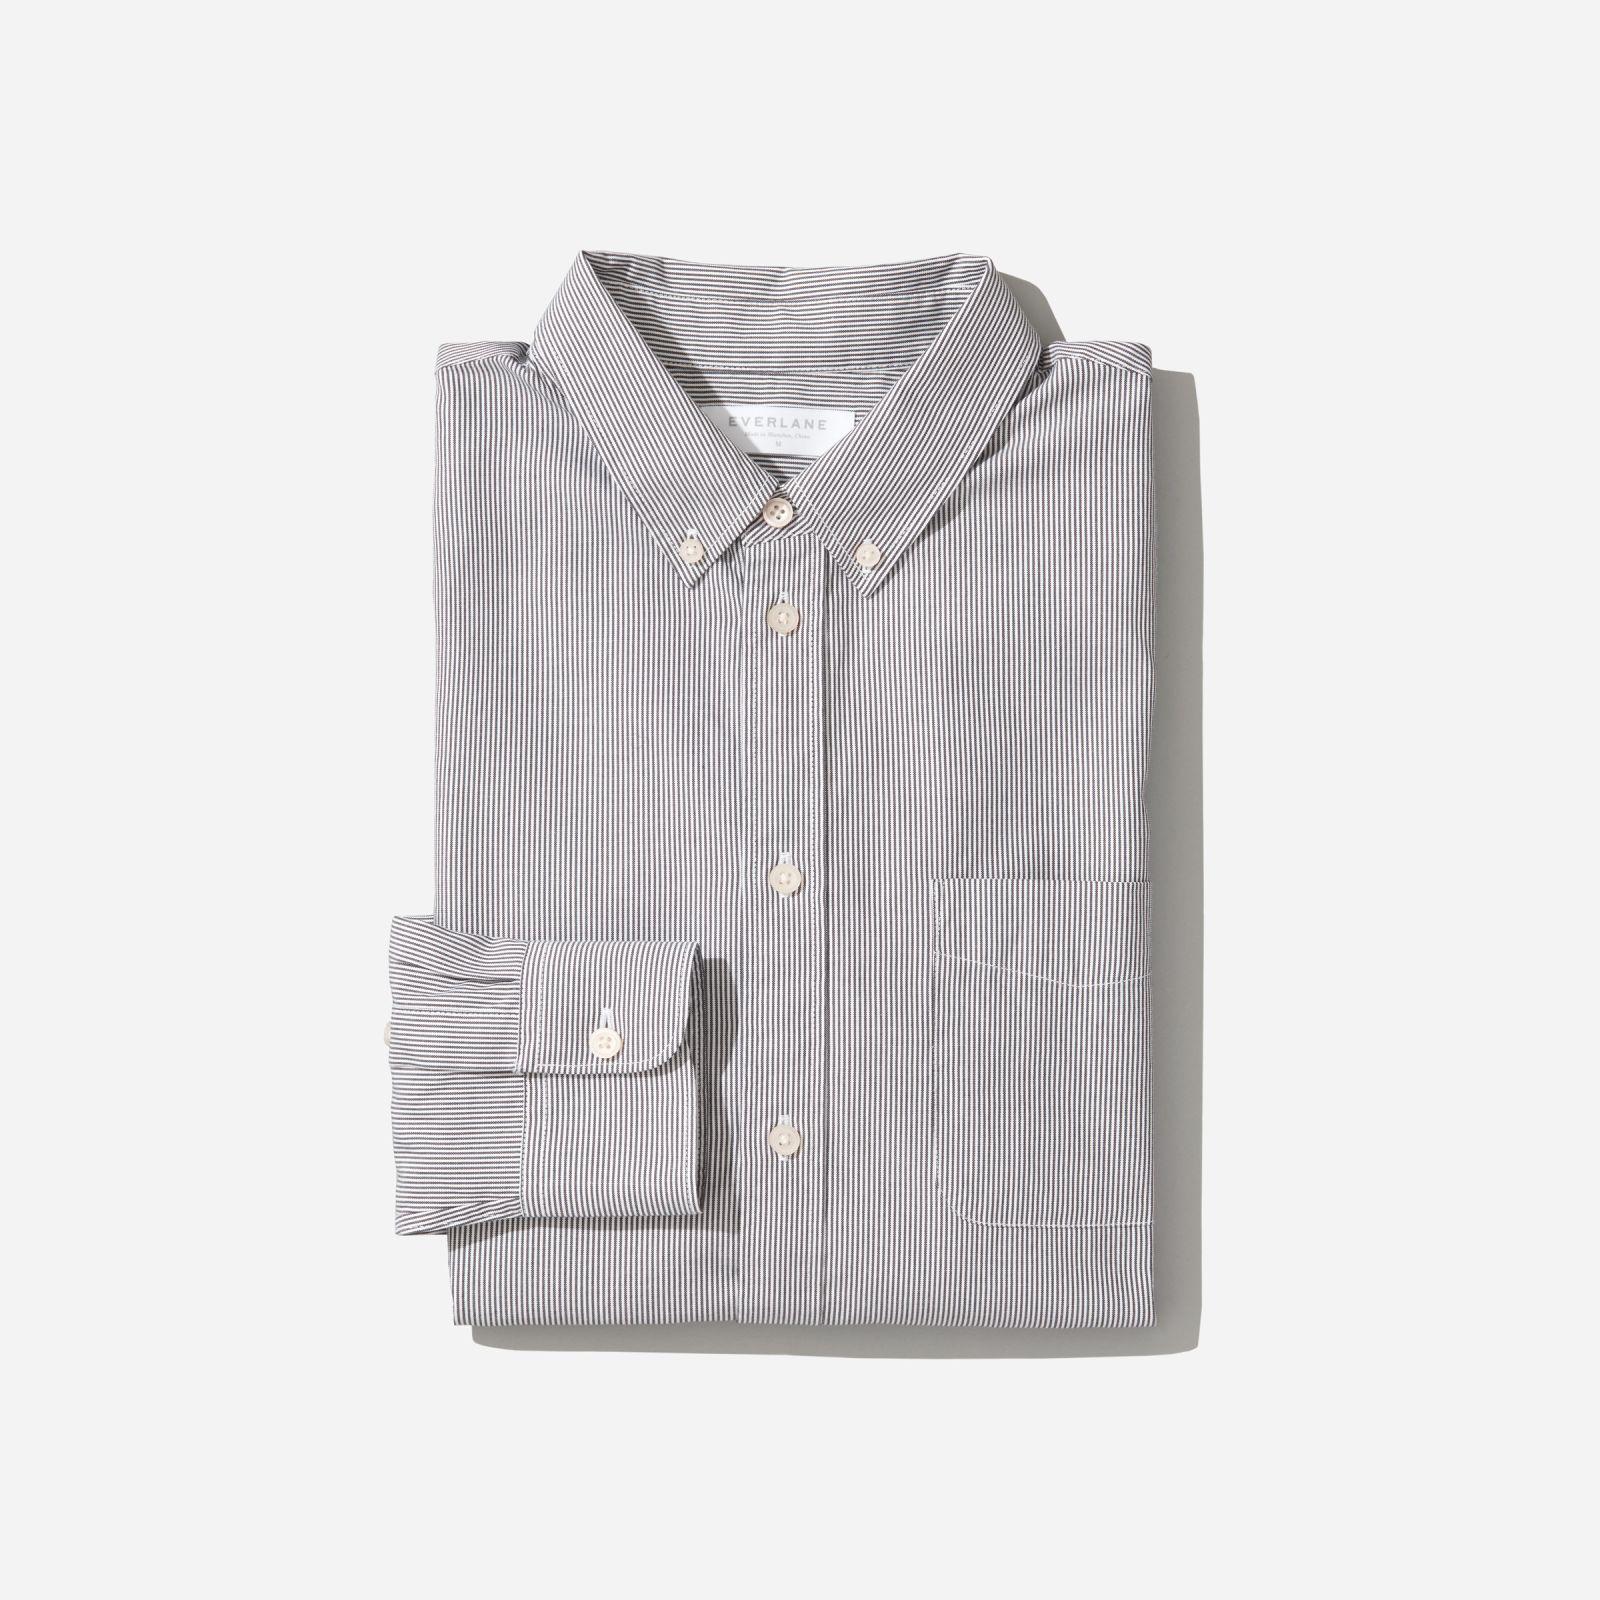 men's air oxford shirt by everlane in black / white mini stripe, size xl